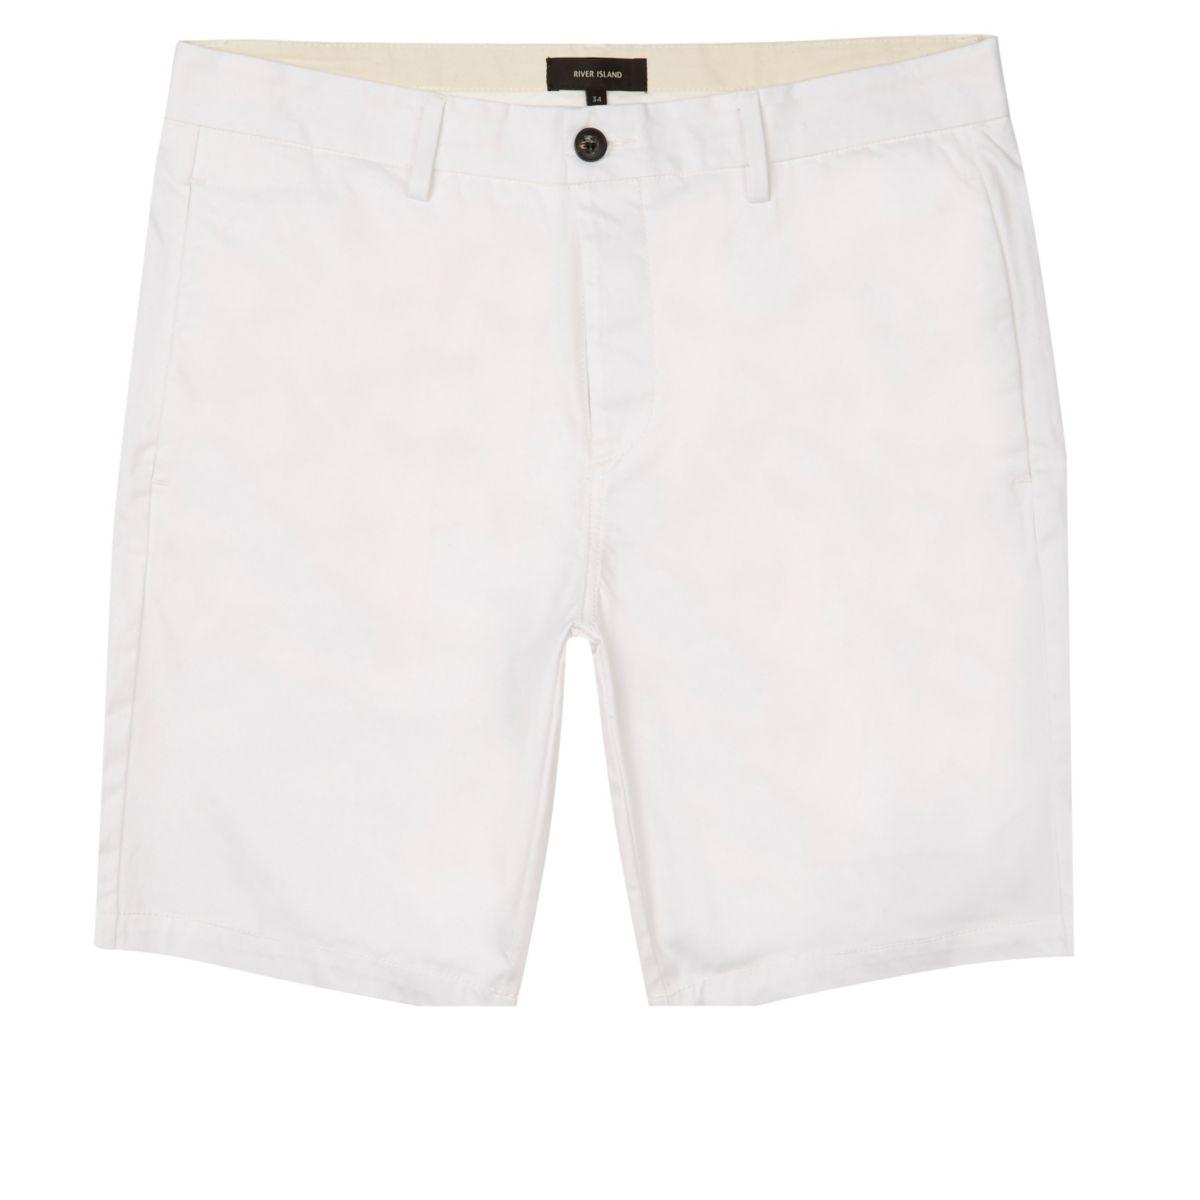 White slim fit bermuda shorts